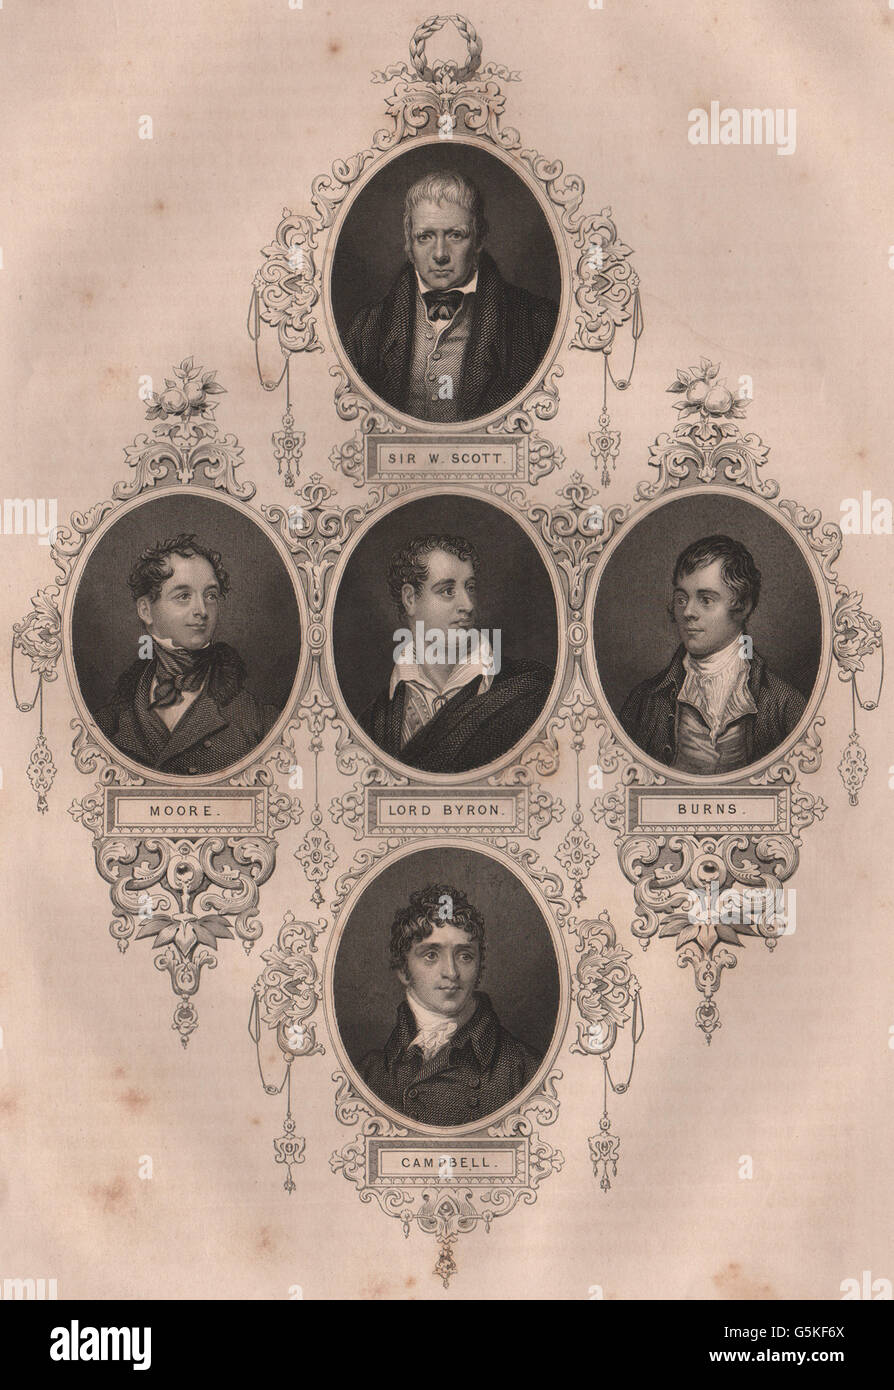 BRITISH HISTORY: Sir Walter Scott; Moore; Lord Byron; Burns; Campbell, 1853 - Stock Image